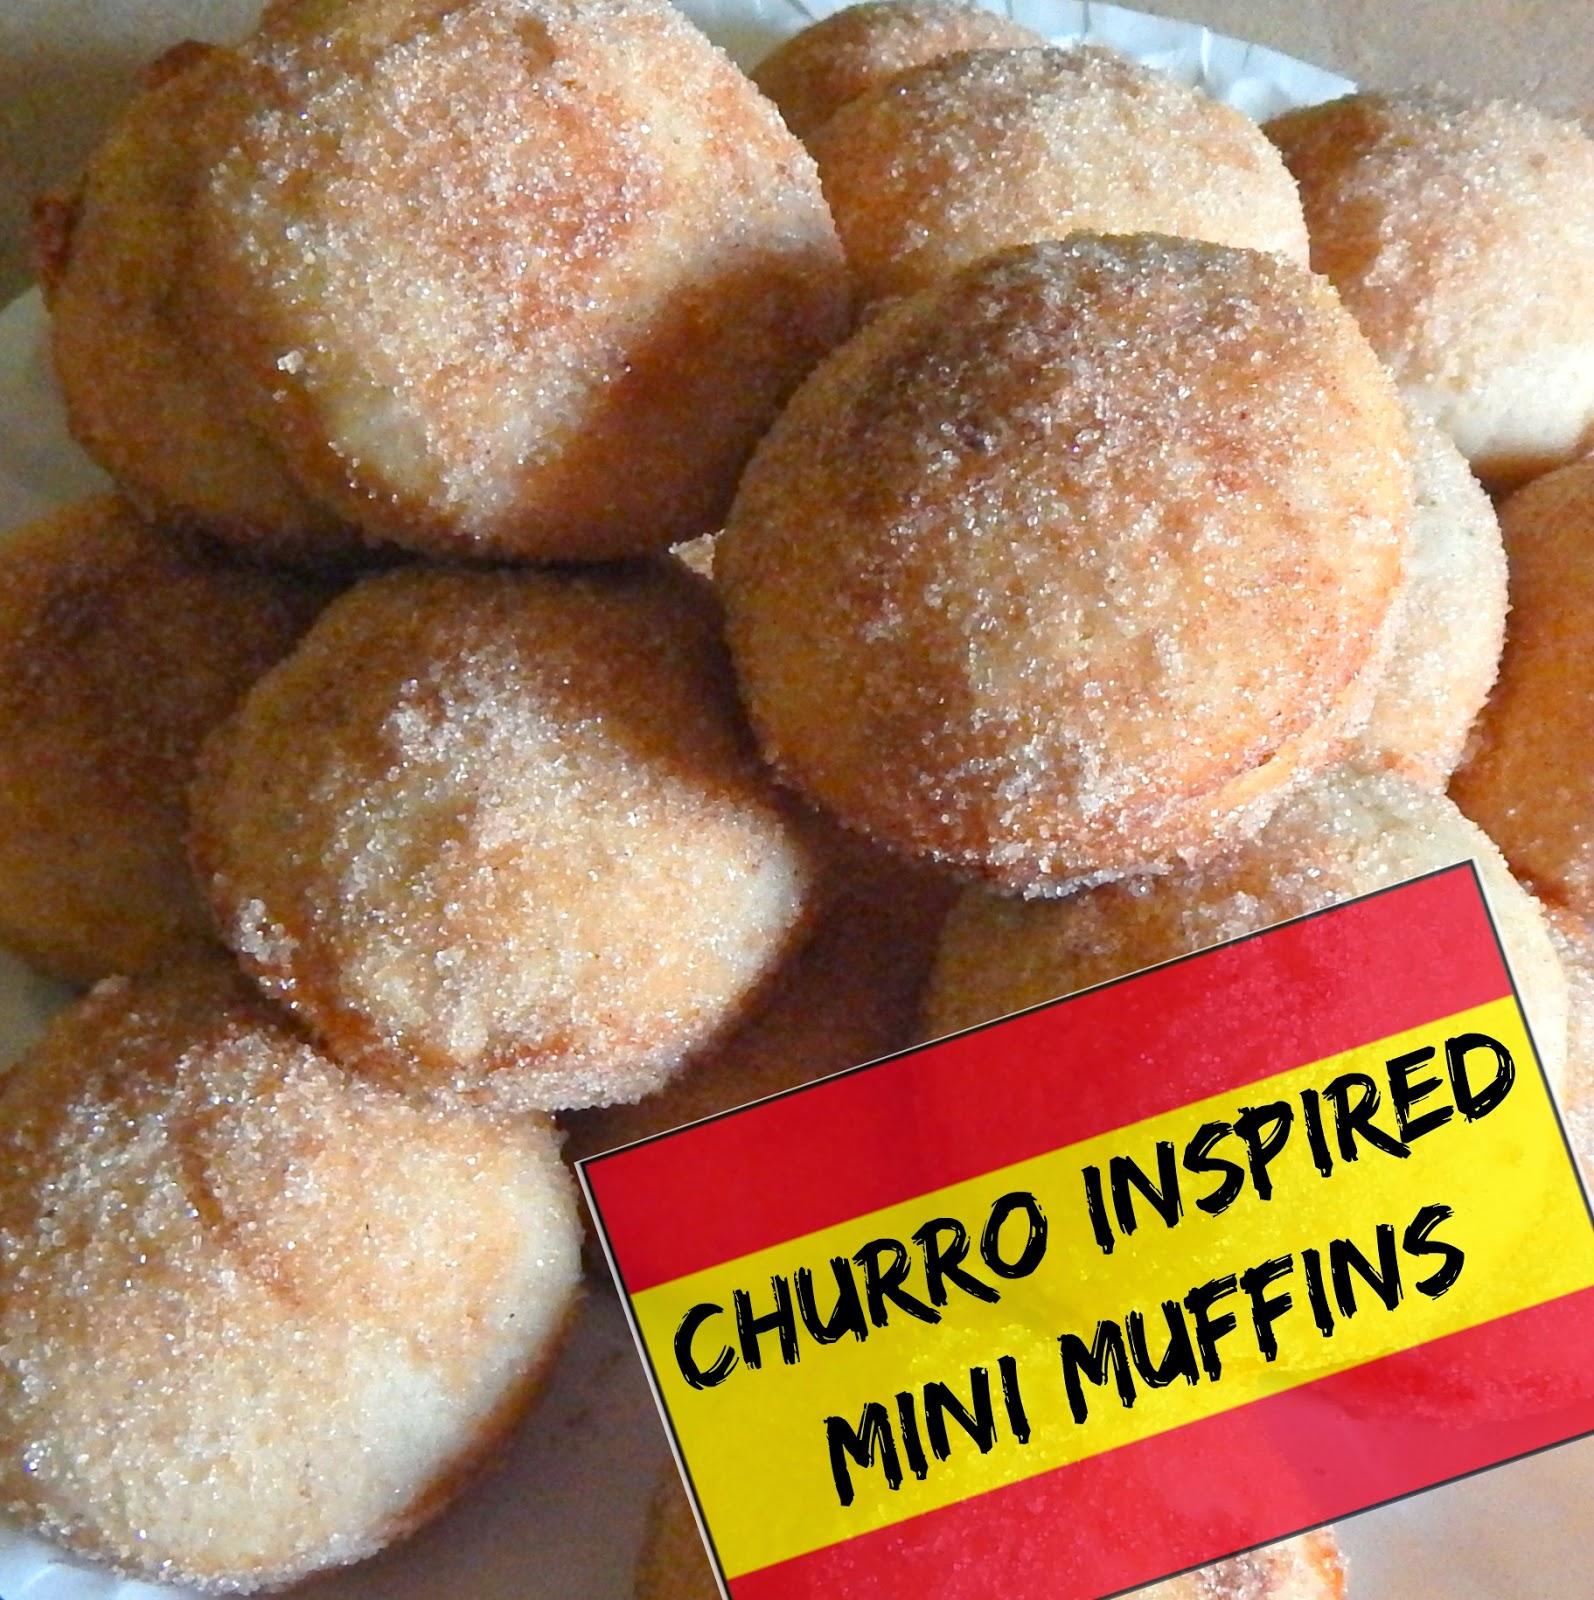 Churro Inspired Mini Muffins